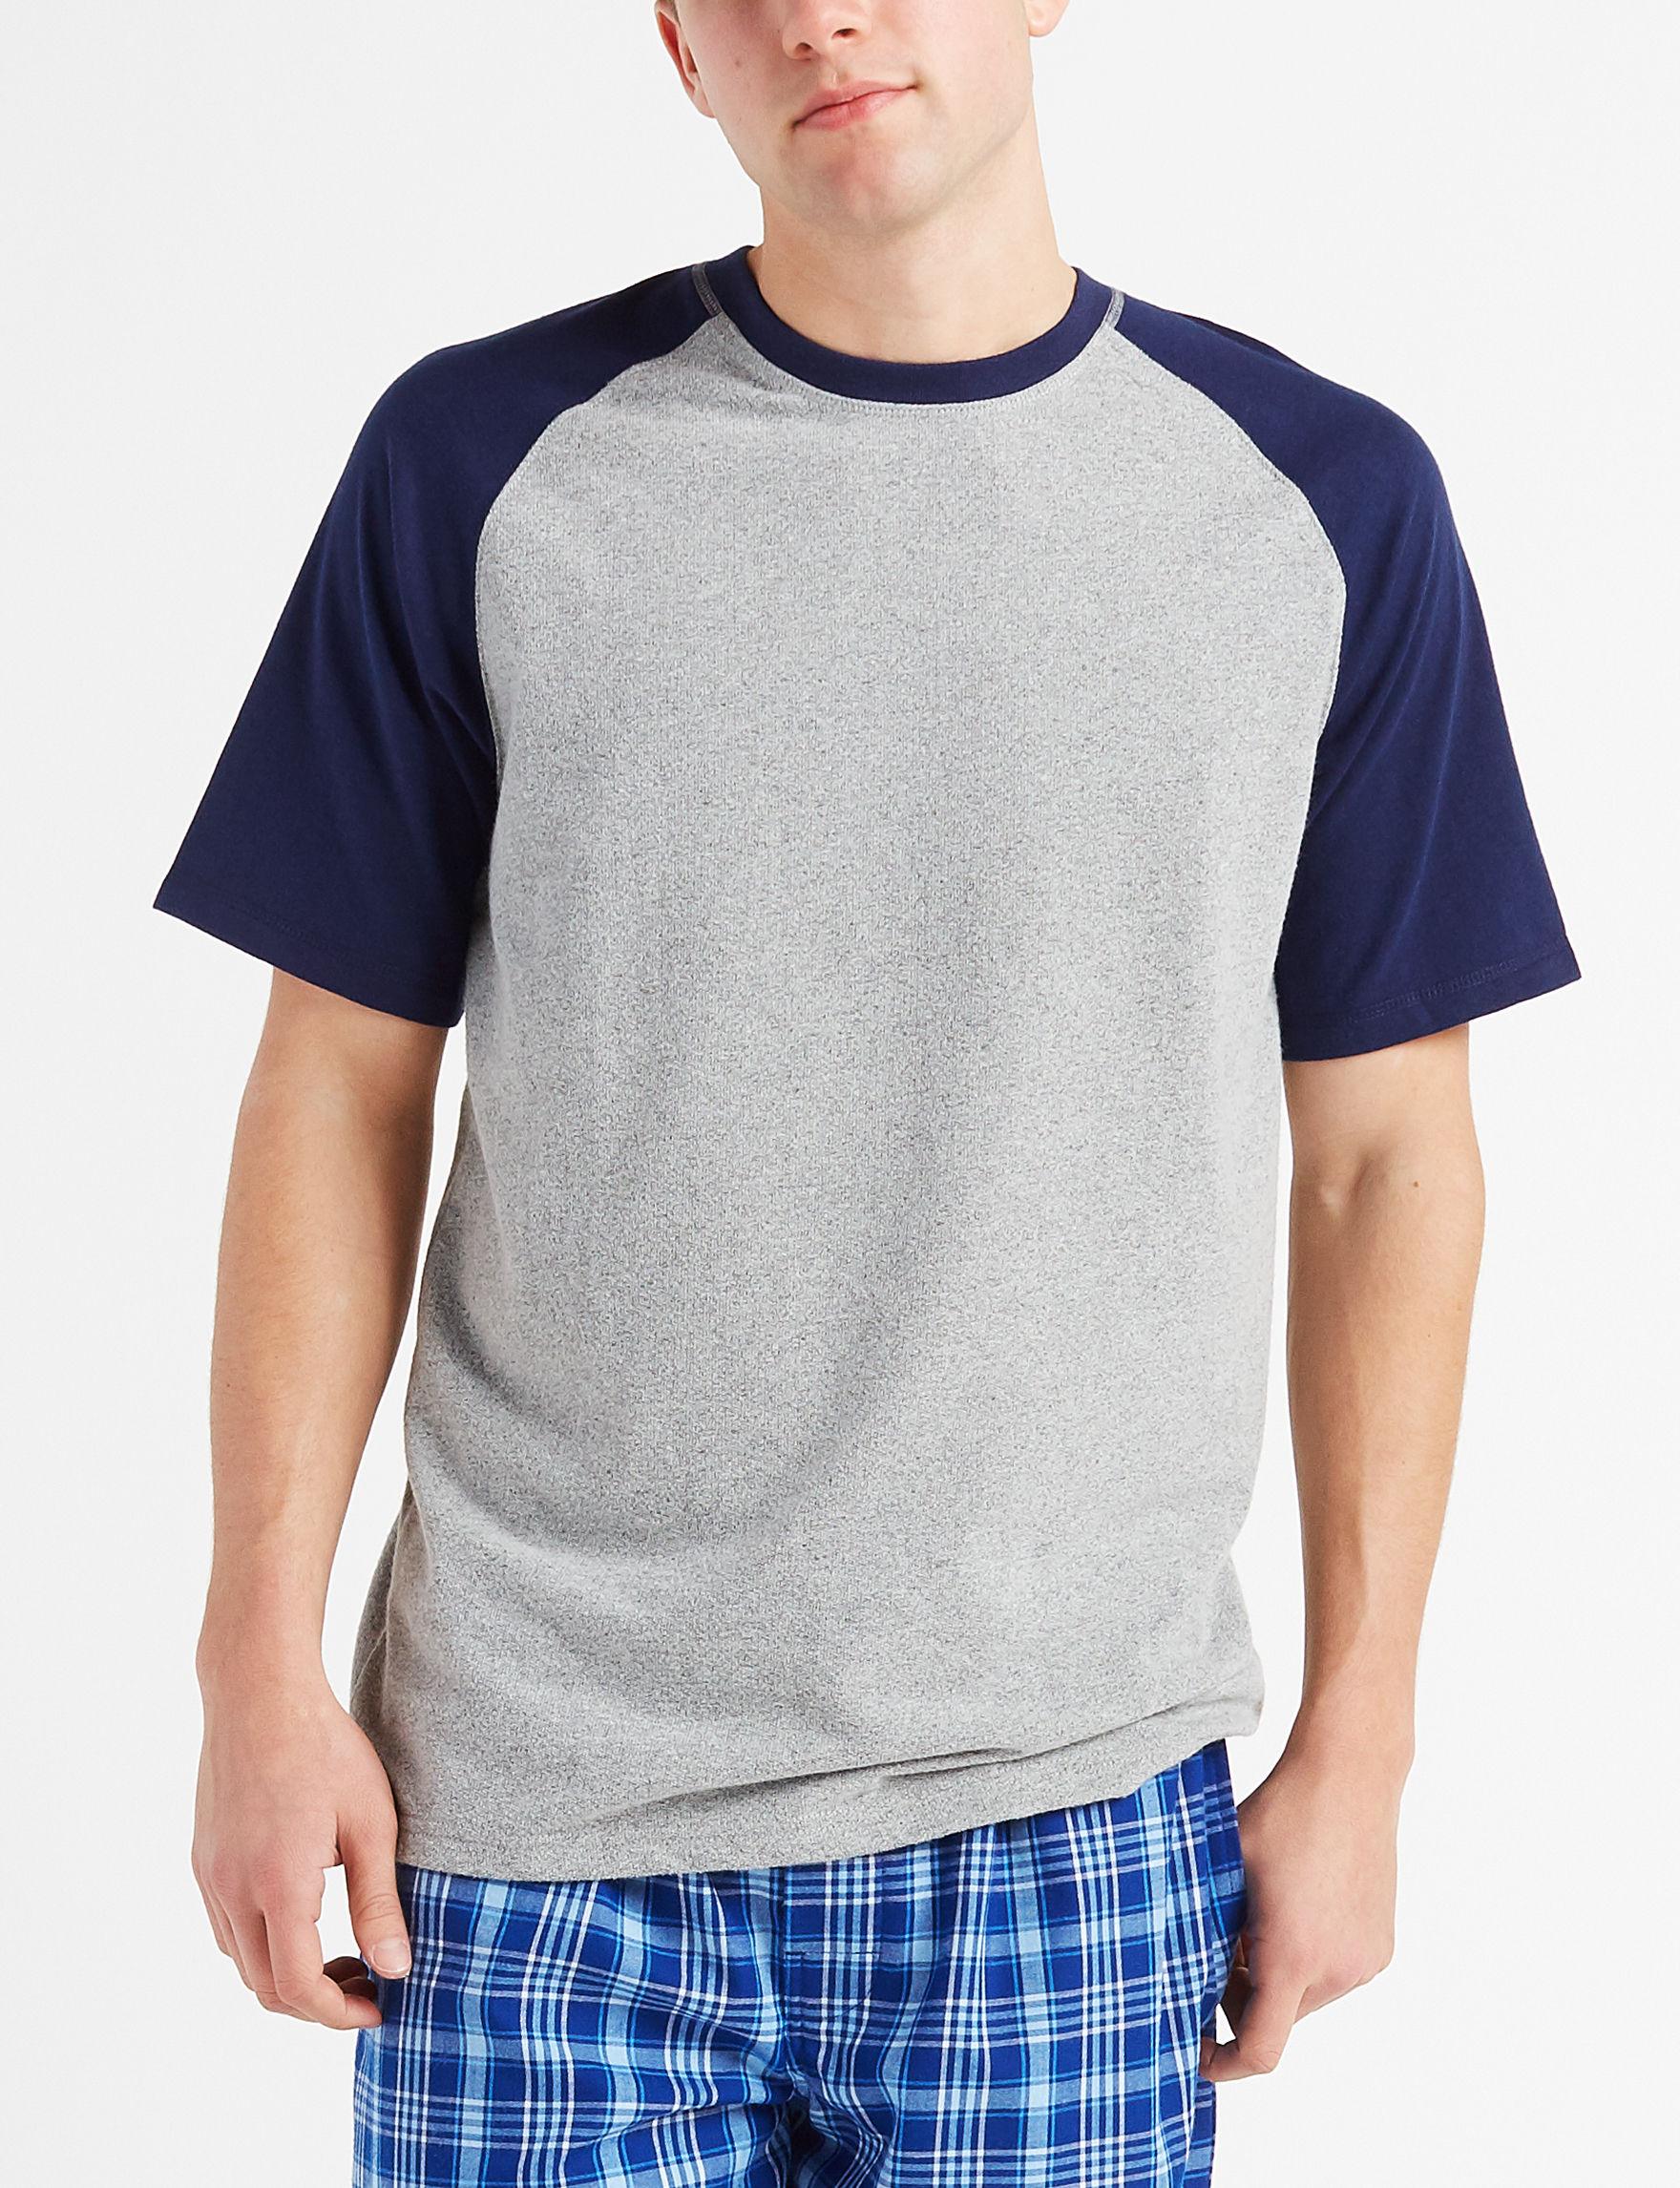 Izod Grey / Navy Pajama Tops